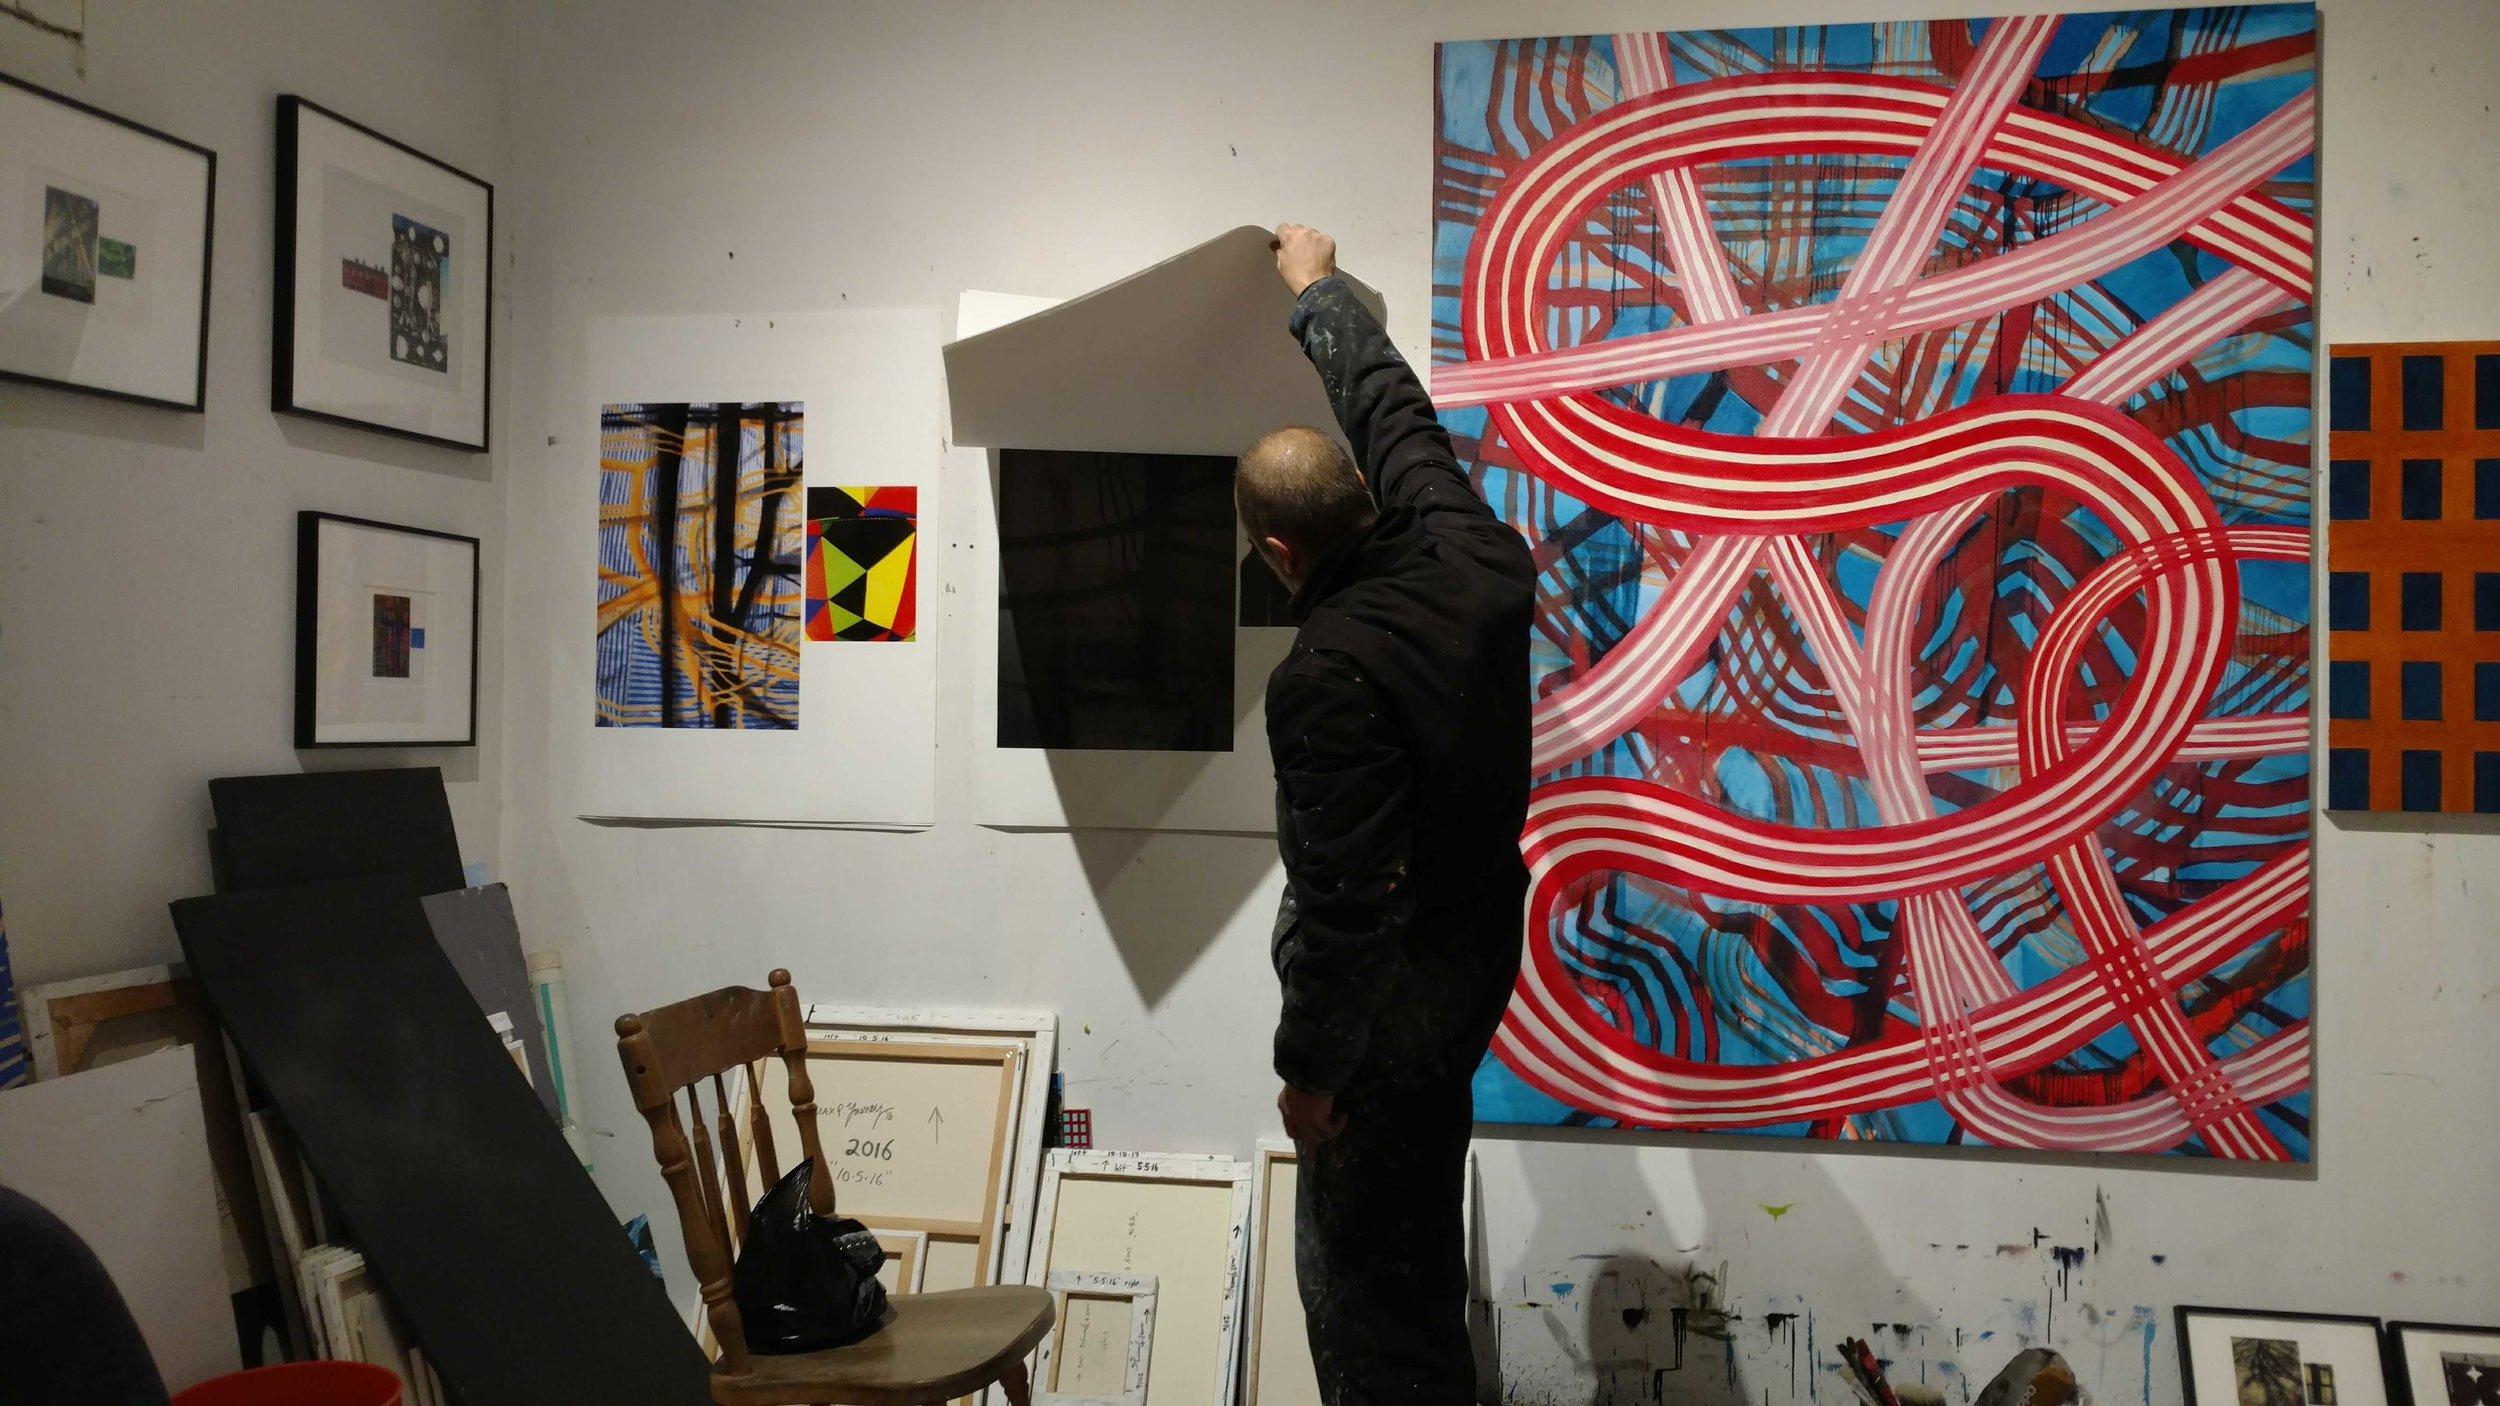 About Max Yawney - BACKGROUNDLives: Brooklyn, NY, USAEducation: Long Island University Brookville, NY- MFA, Painting, 1998;Rochester Institute of Technology Rochester, NY- BFA, Photography, 1986